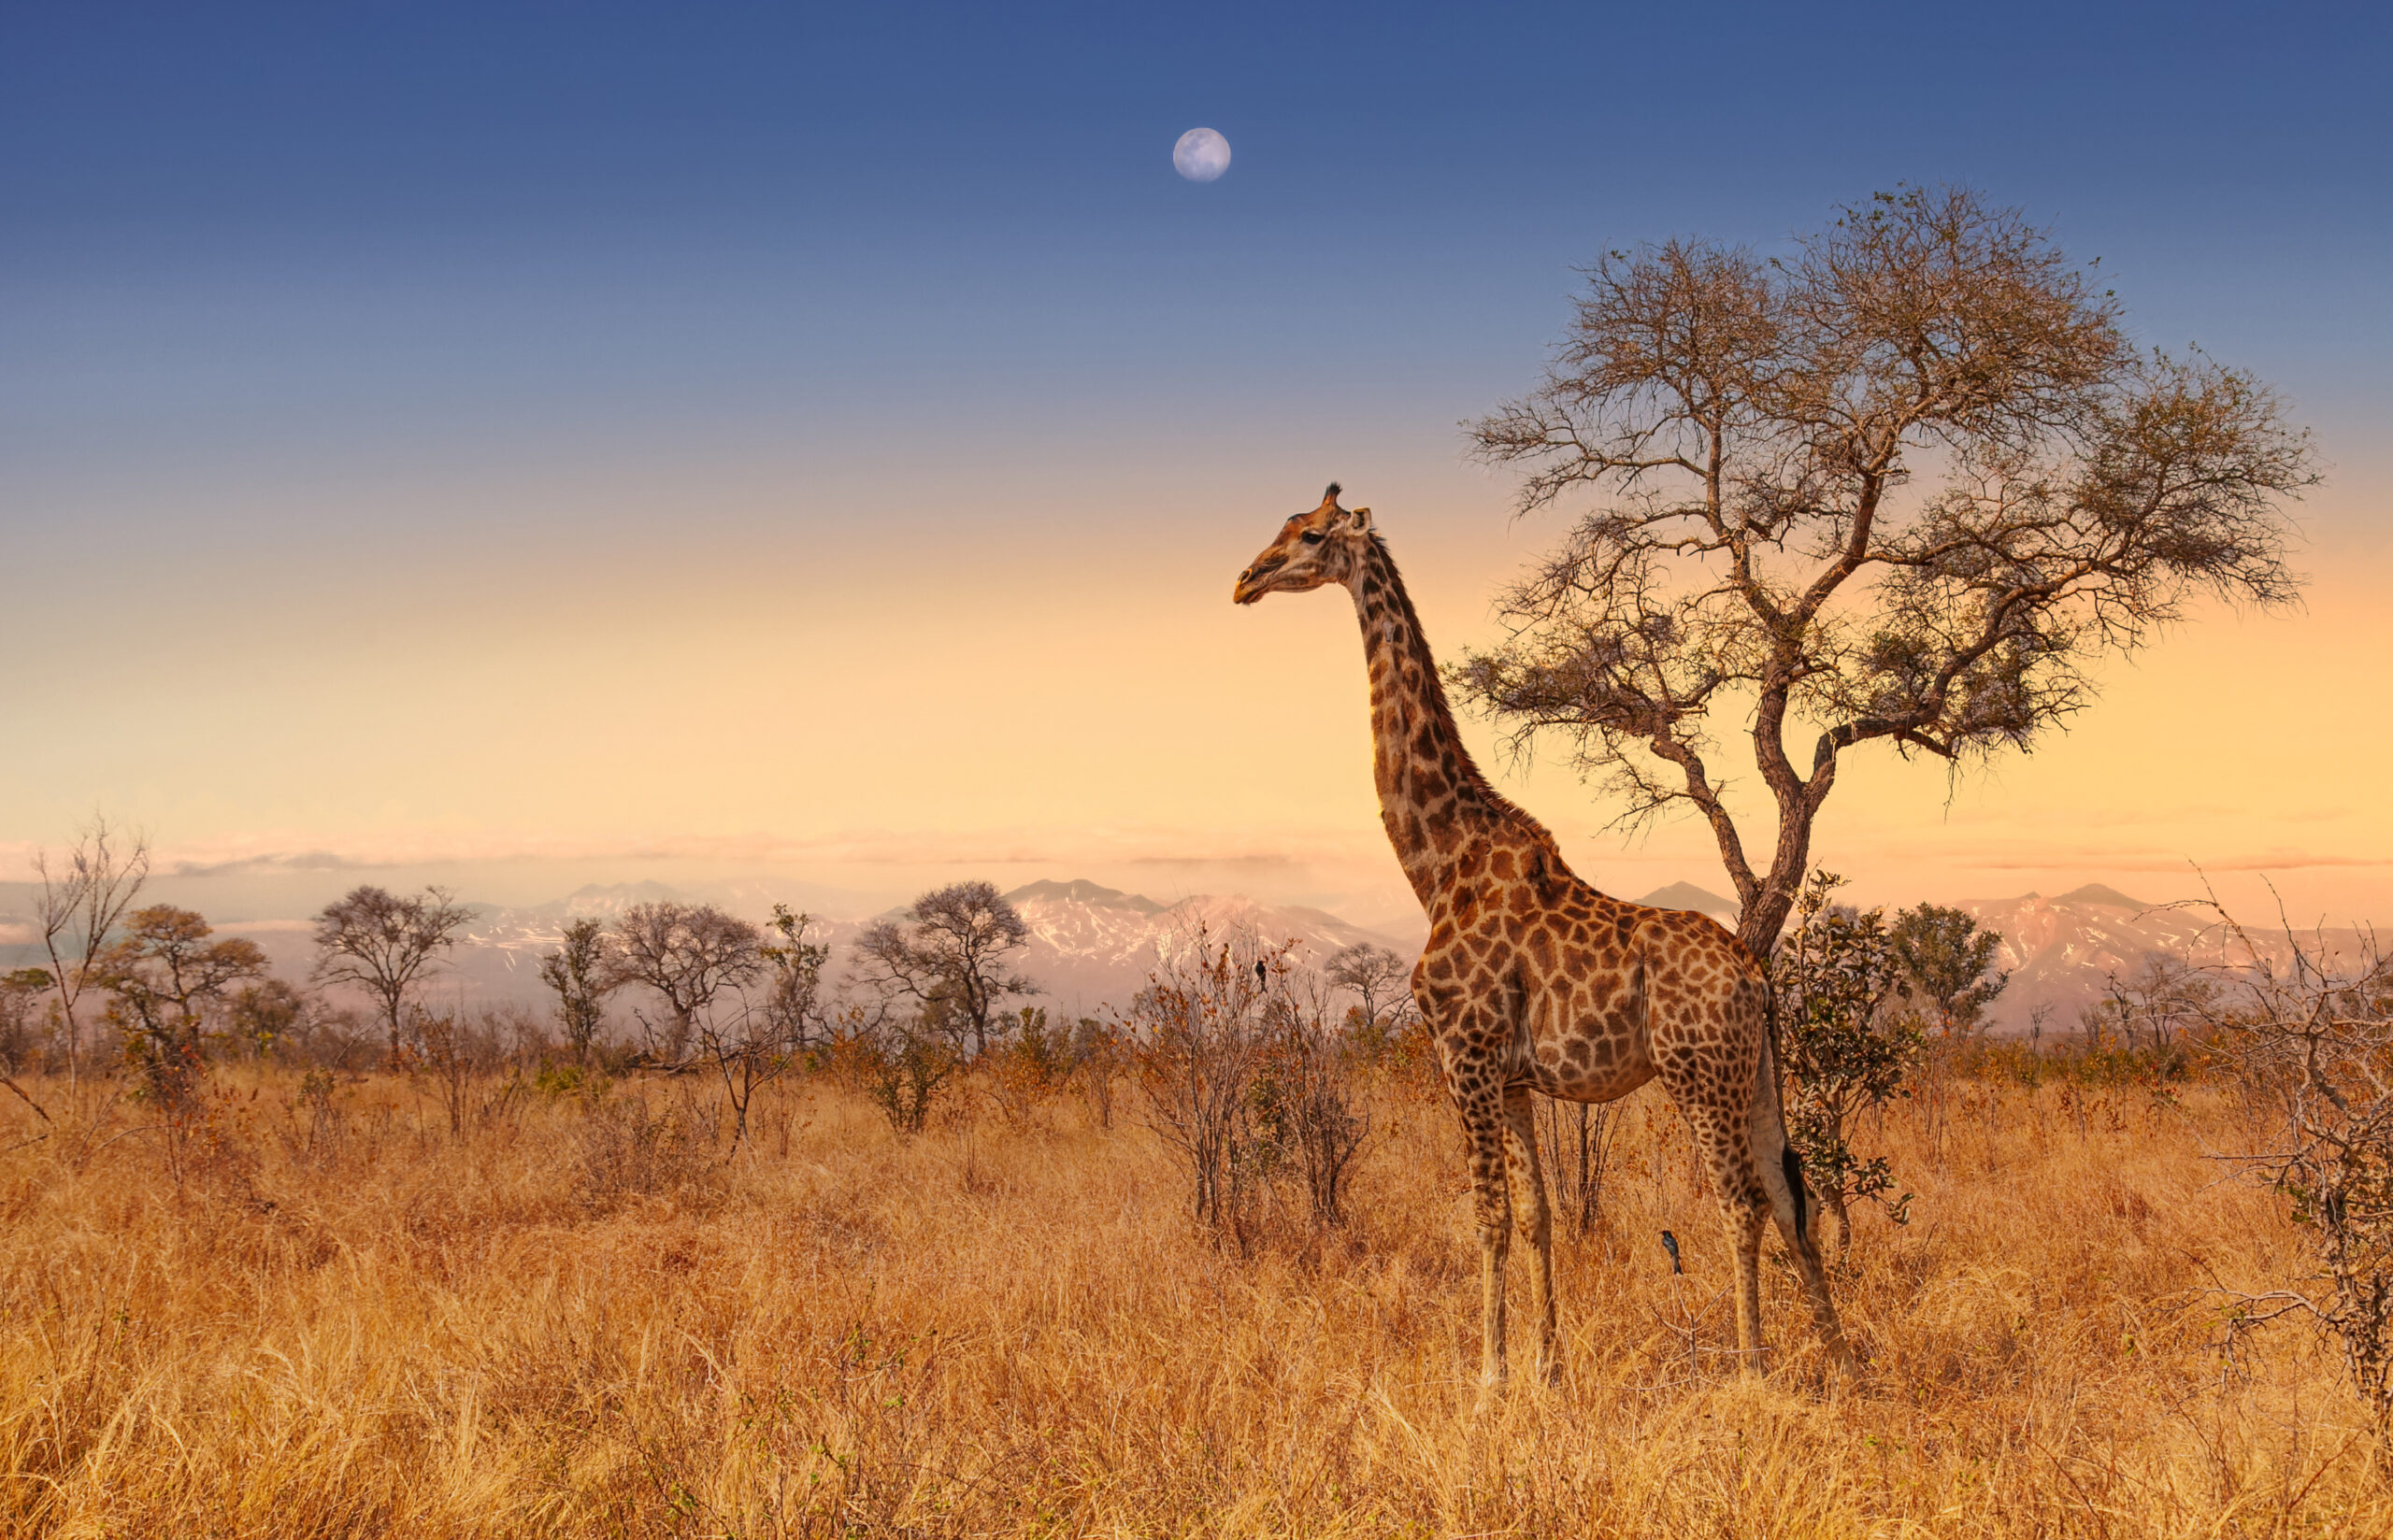 Giraffe in game reserve